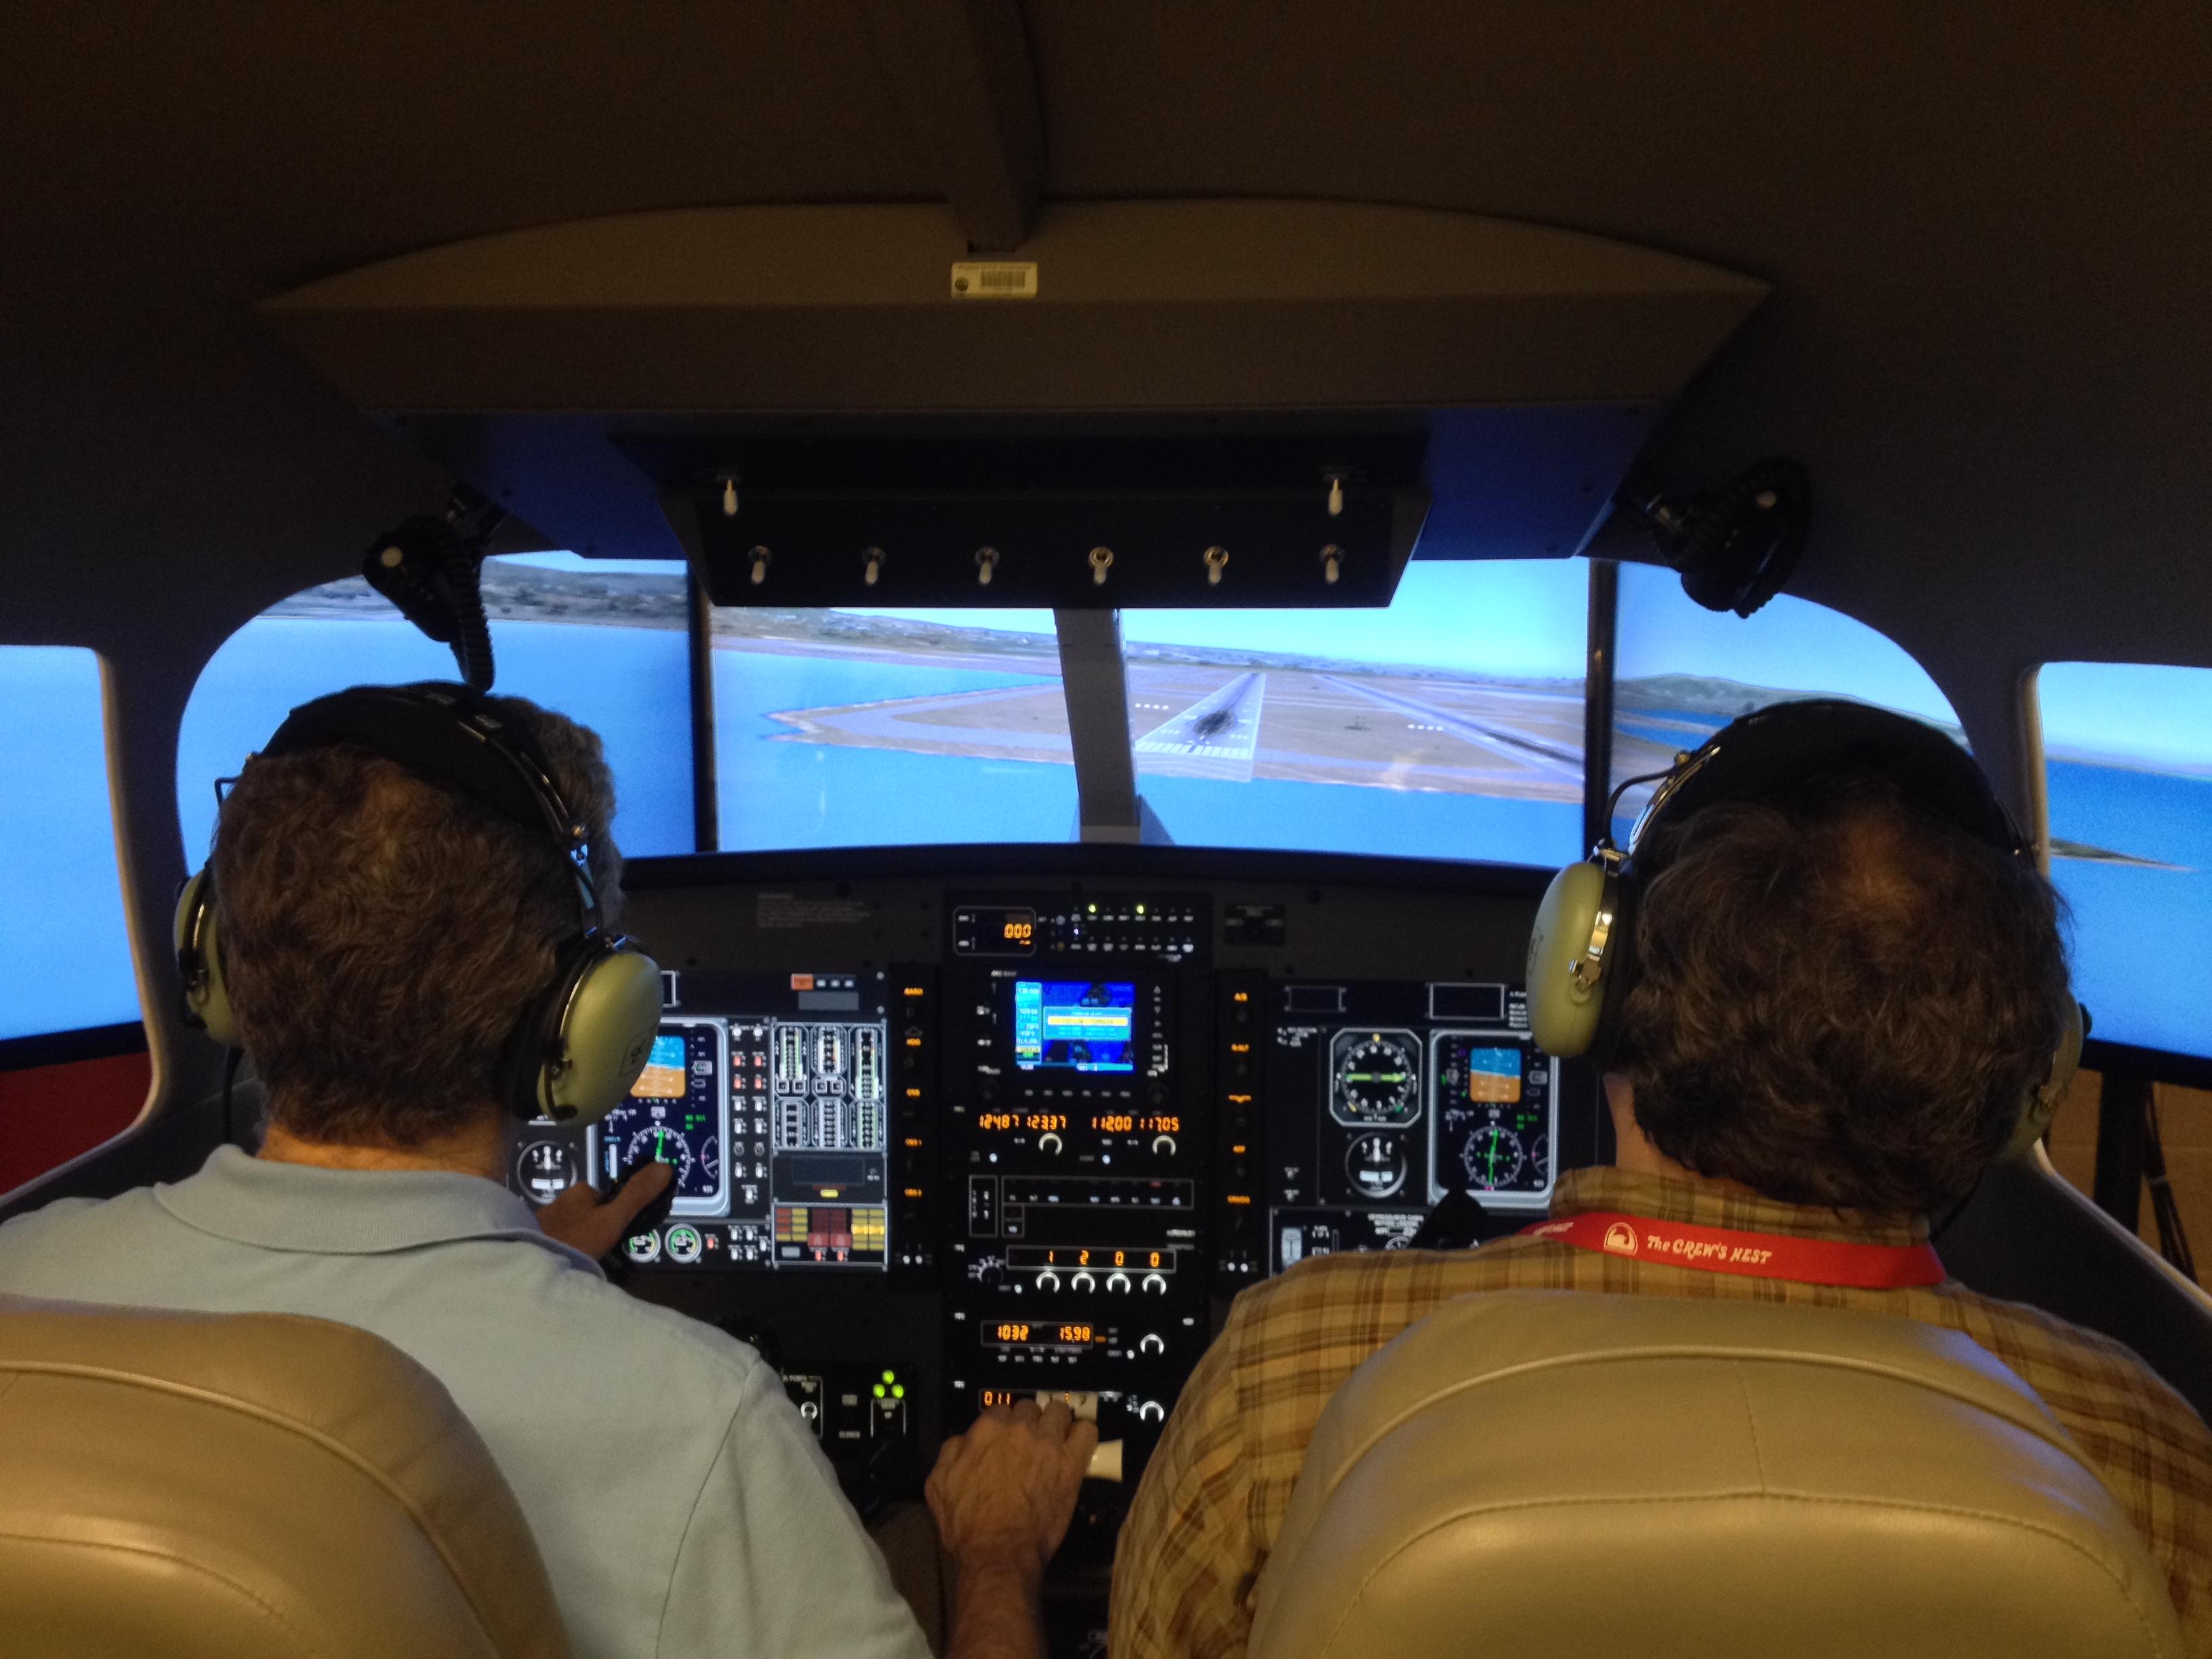 astronaut flight simulator - photo #12